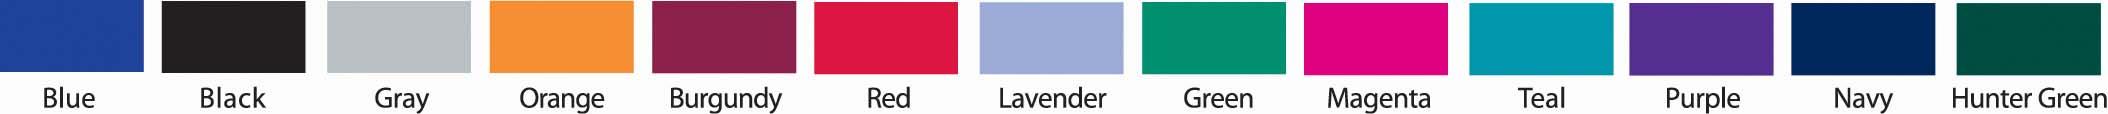 spectrum-nurse-stethoscope-adult-slider-pack-lavender-10-431-110-lr-2.jpg